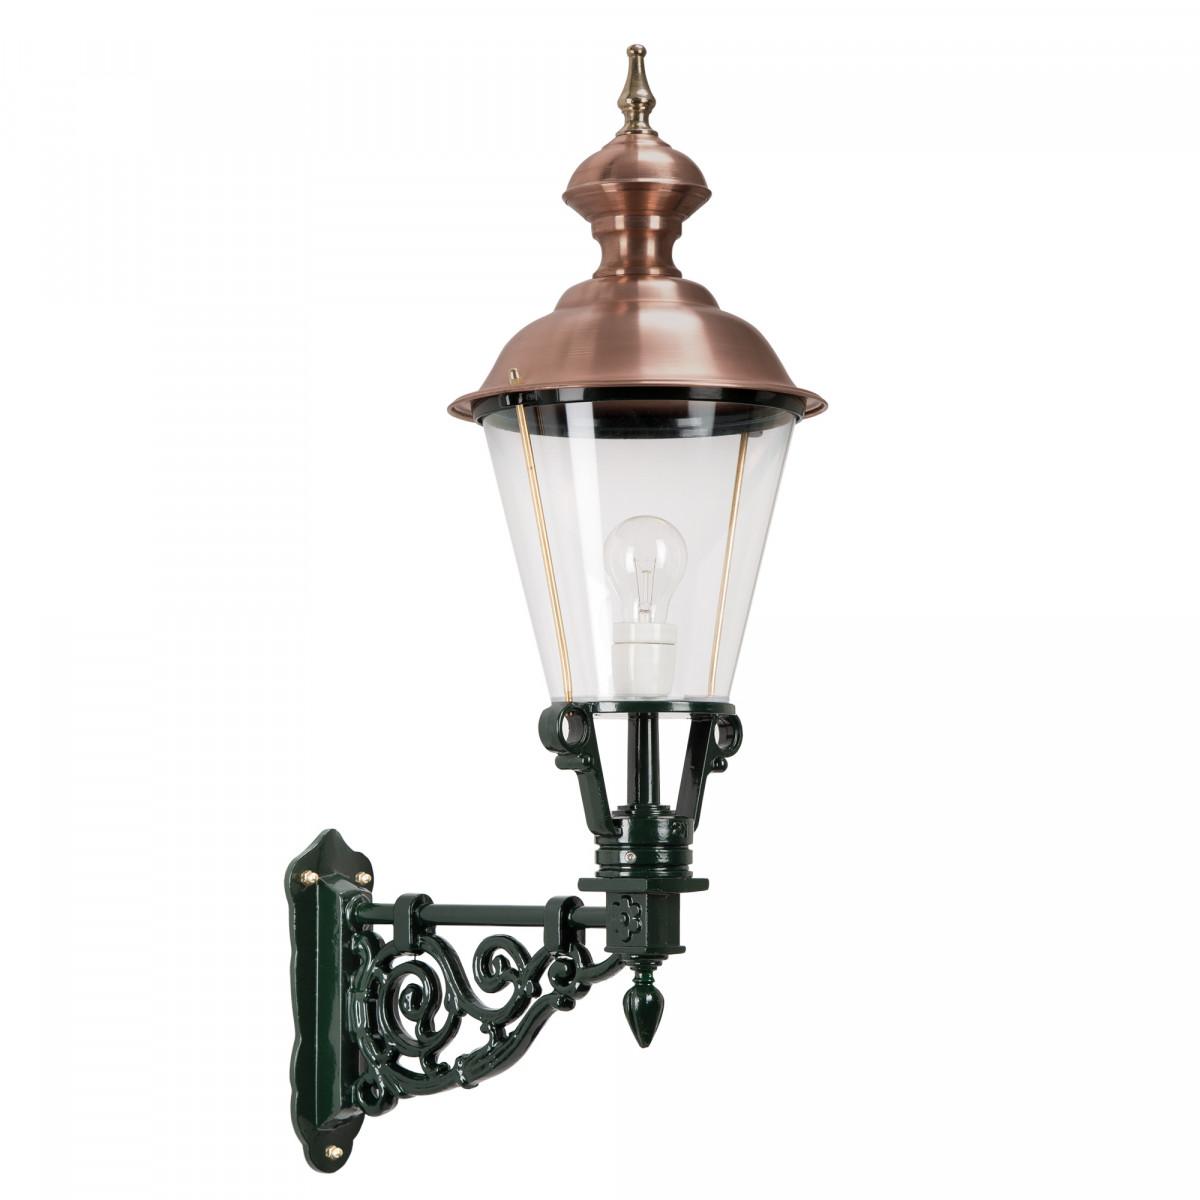 KS buitenverlichting - Wandlamp Marken 1216